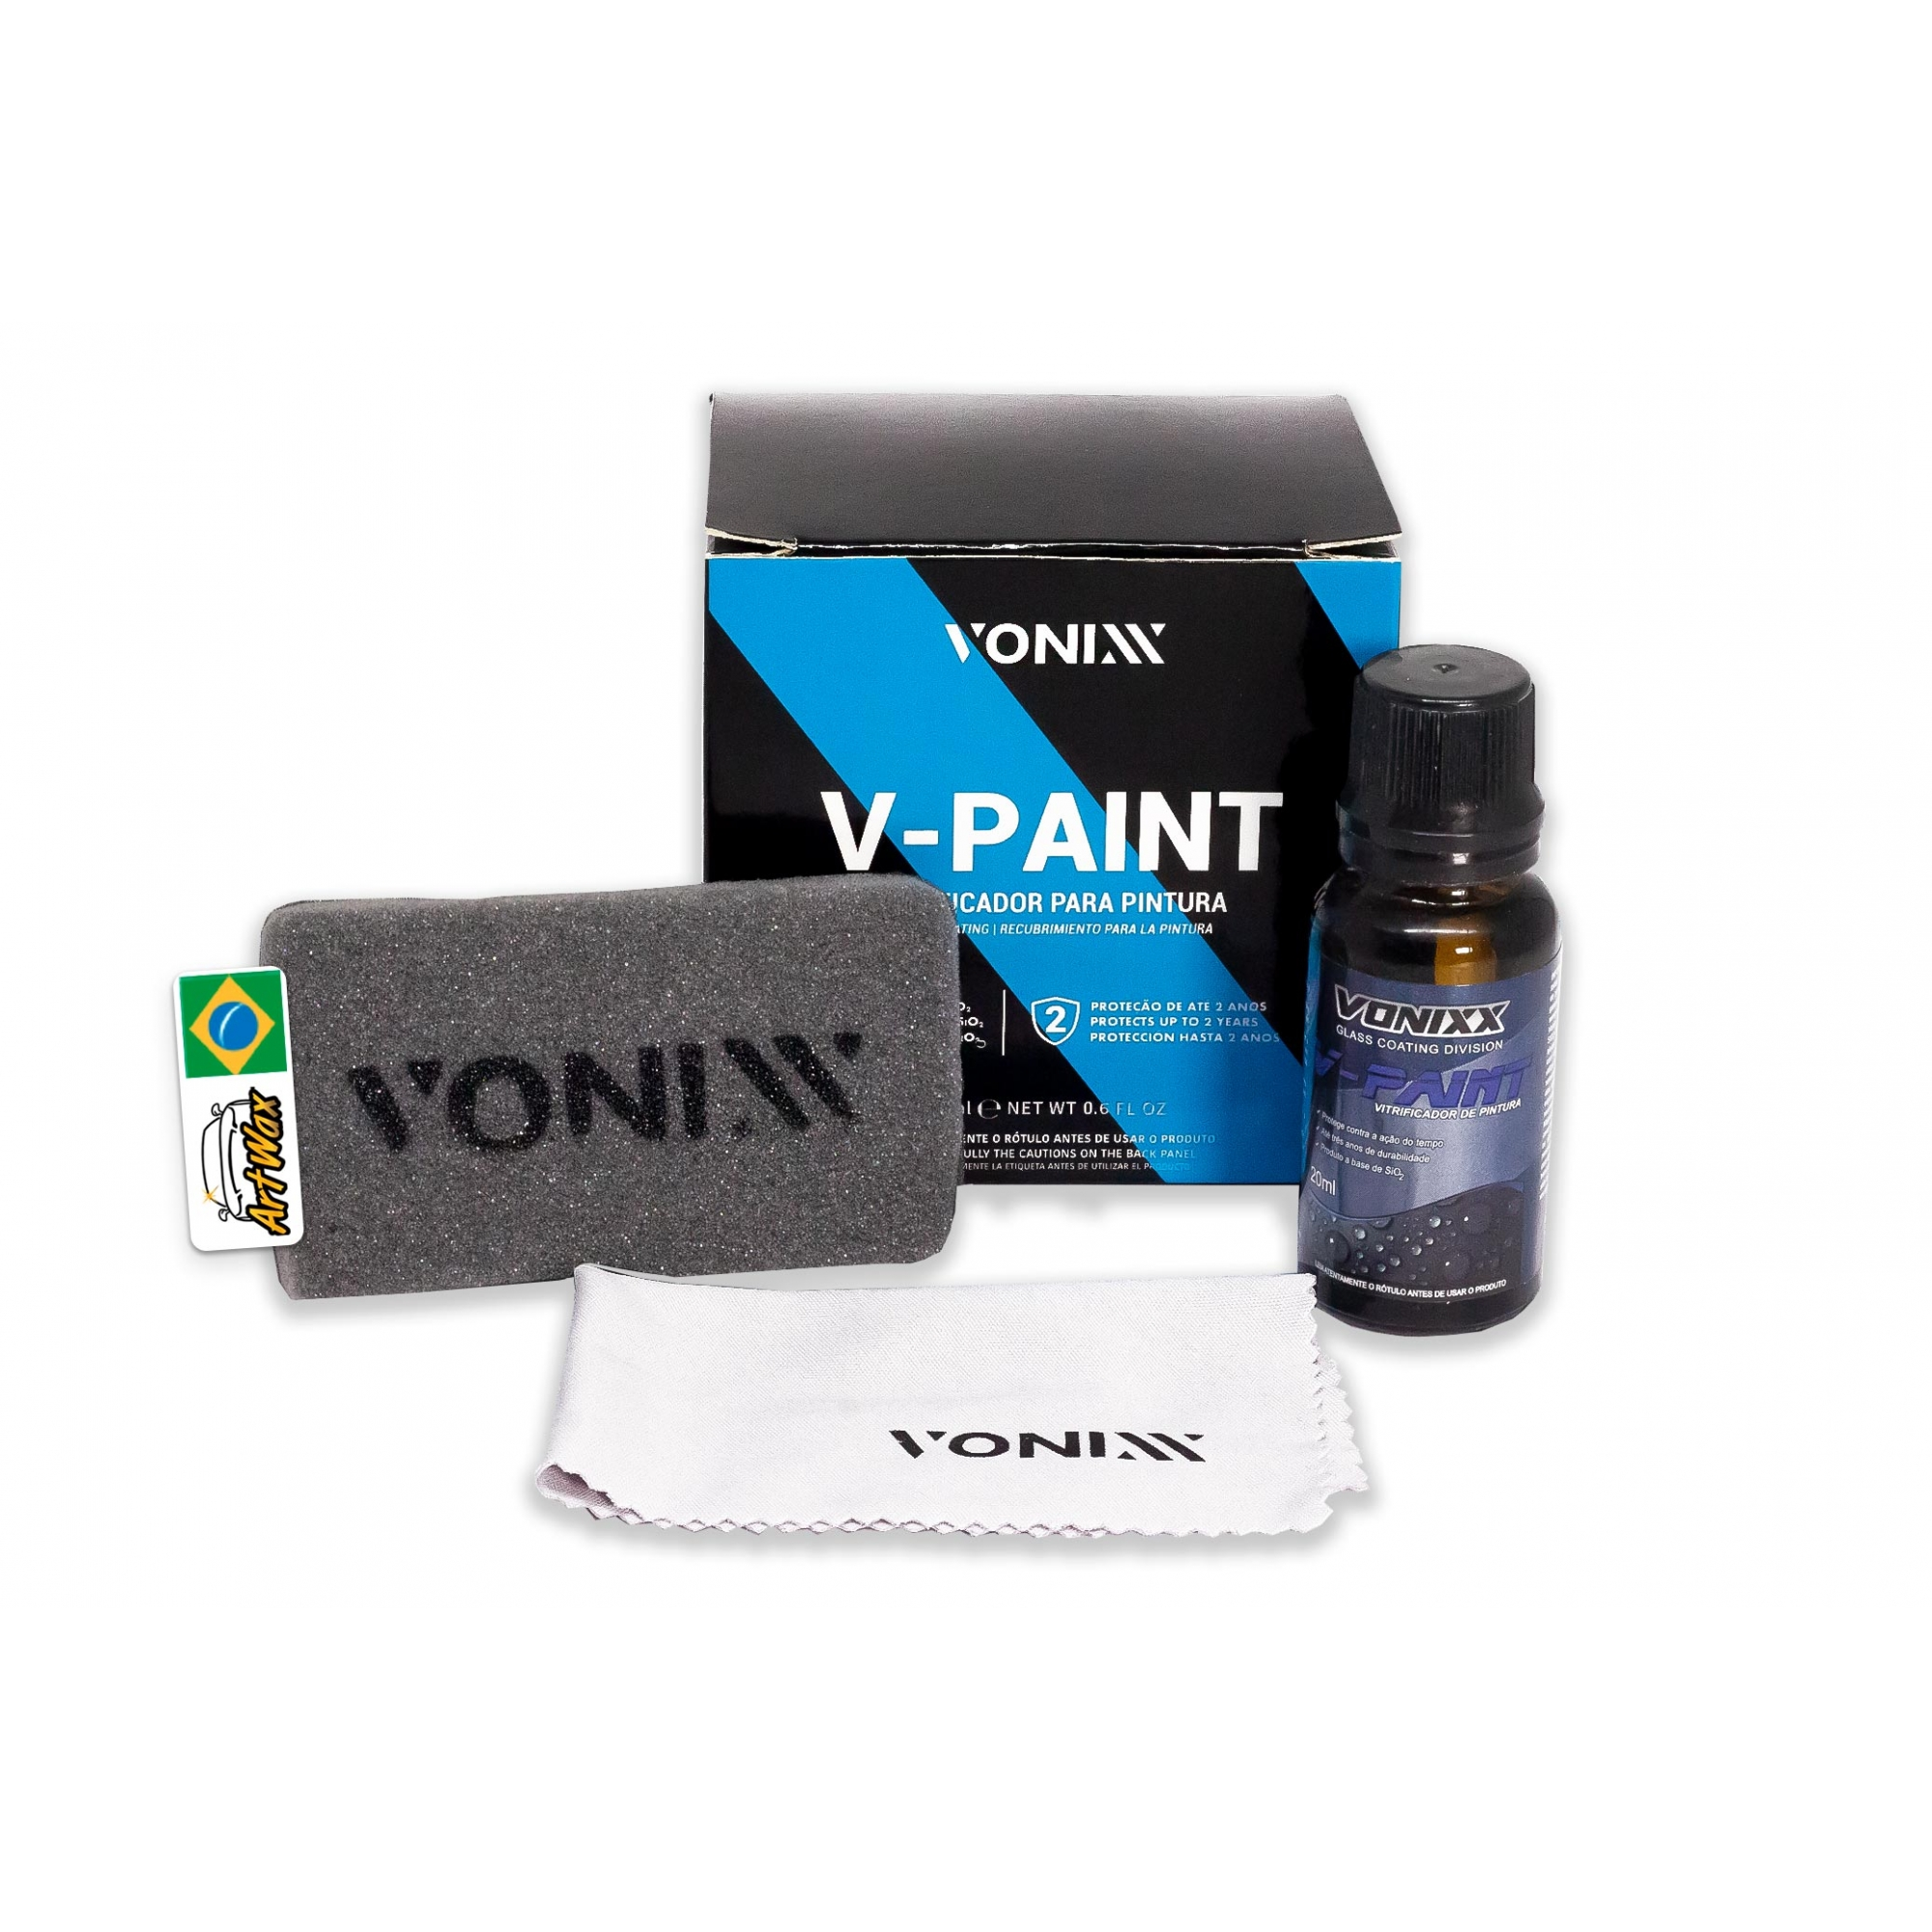 Vitrificador de Pintura Vonixx V-Paint - 20ml